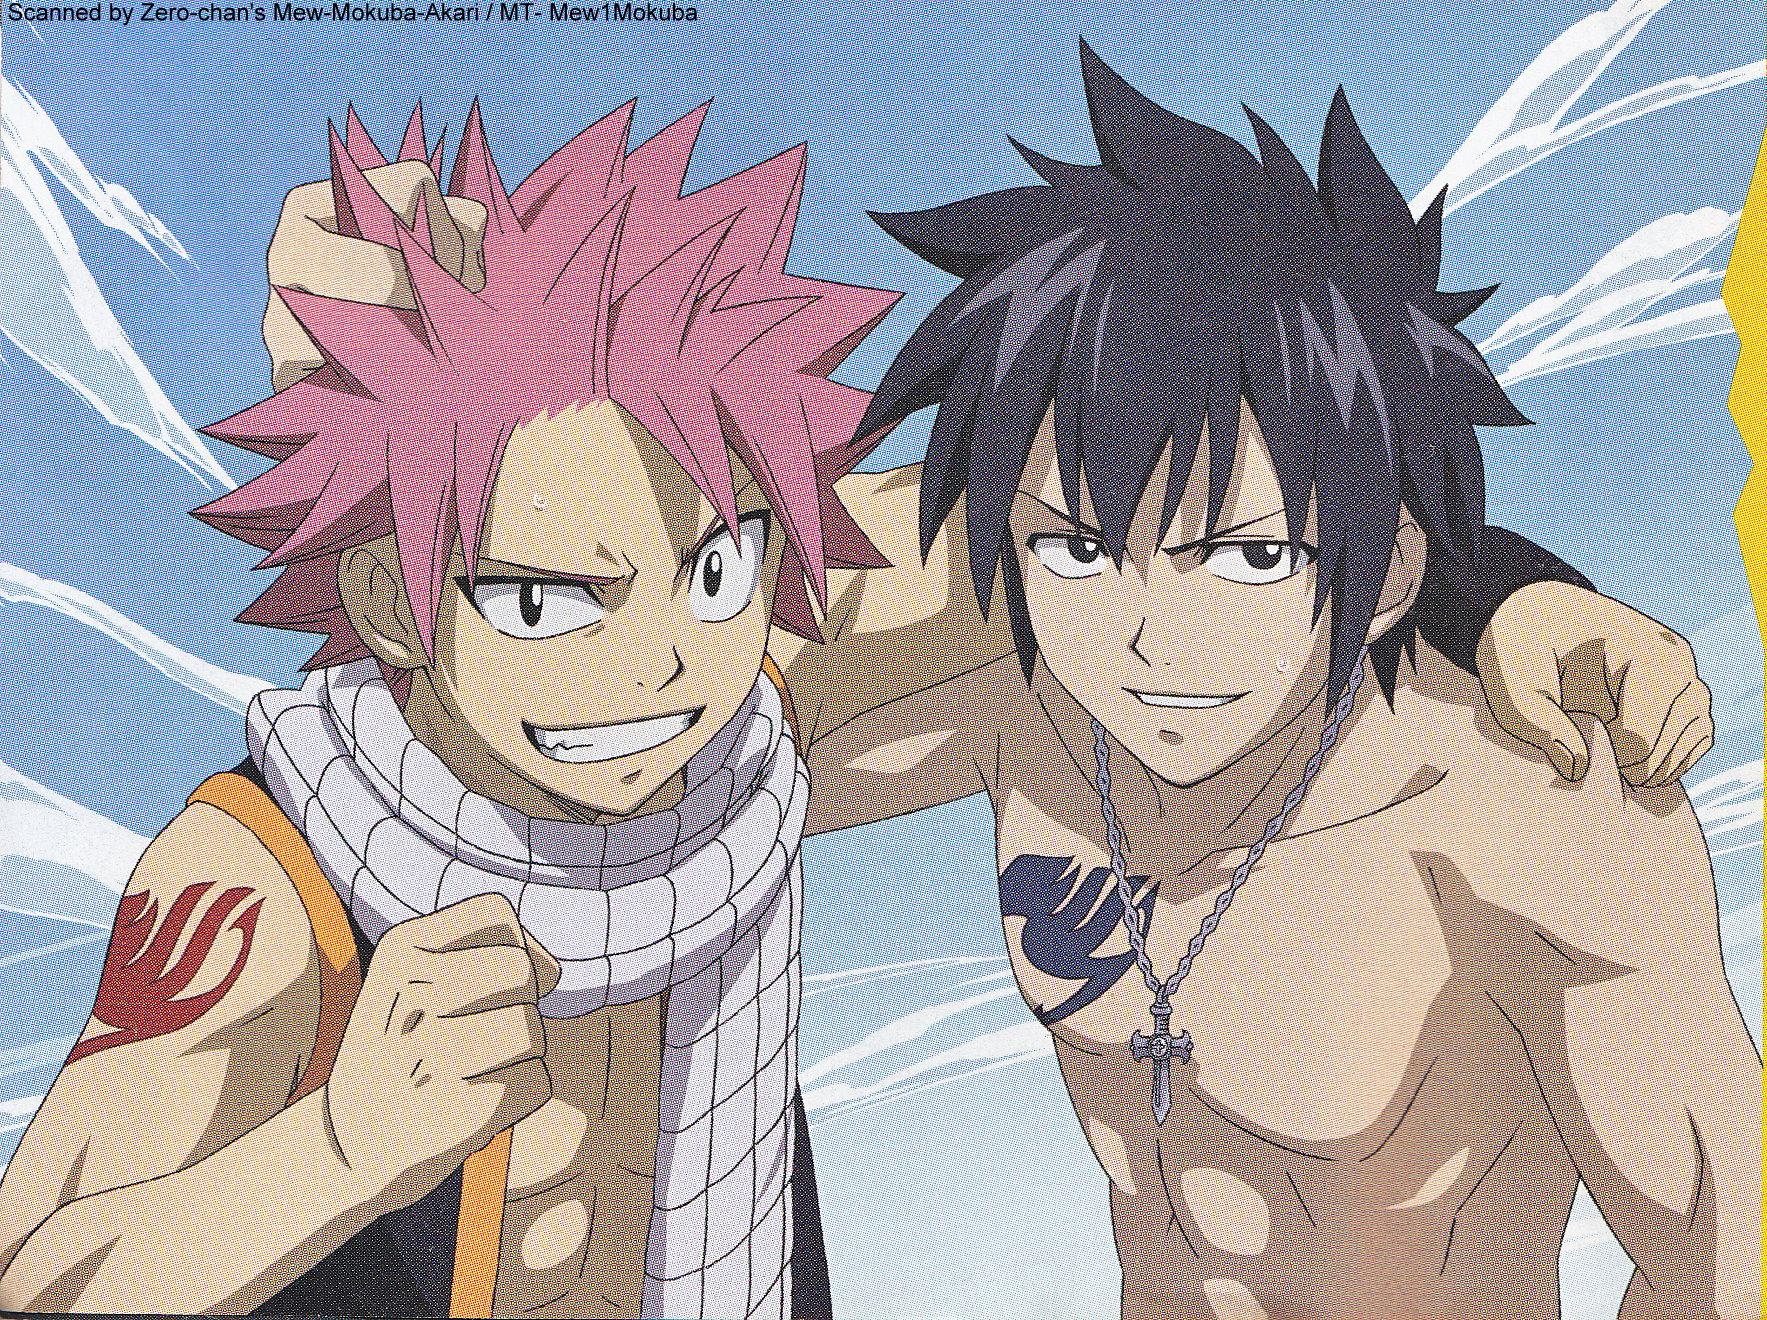 FAIRY TAIL Image #908835 - Zerochan Anime Image Board  Gray Fullbuster And Natsu Dragneel